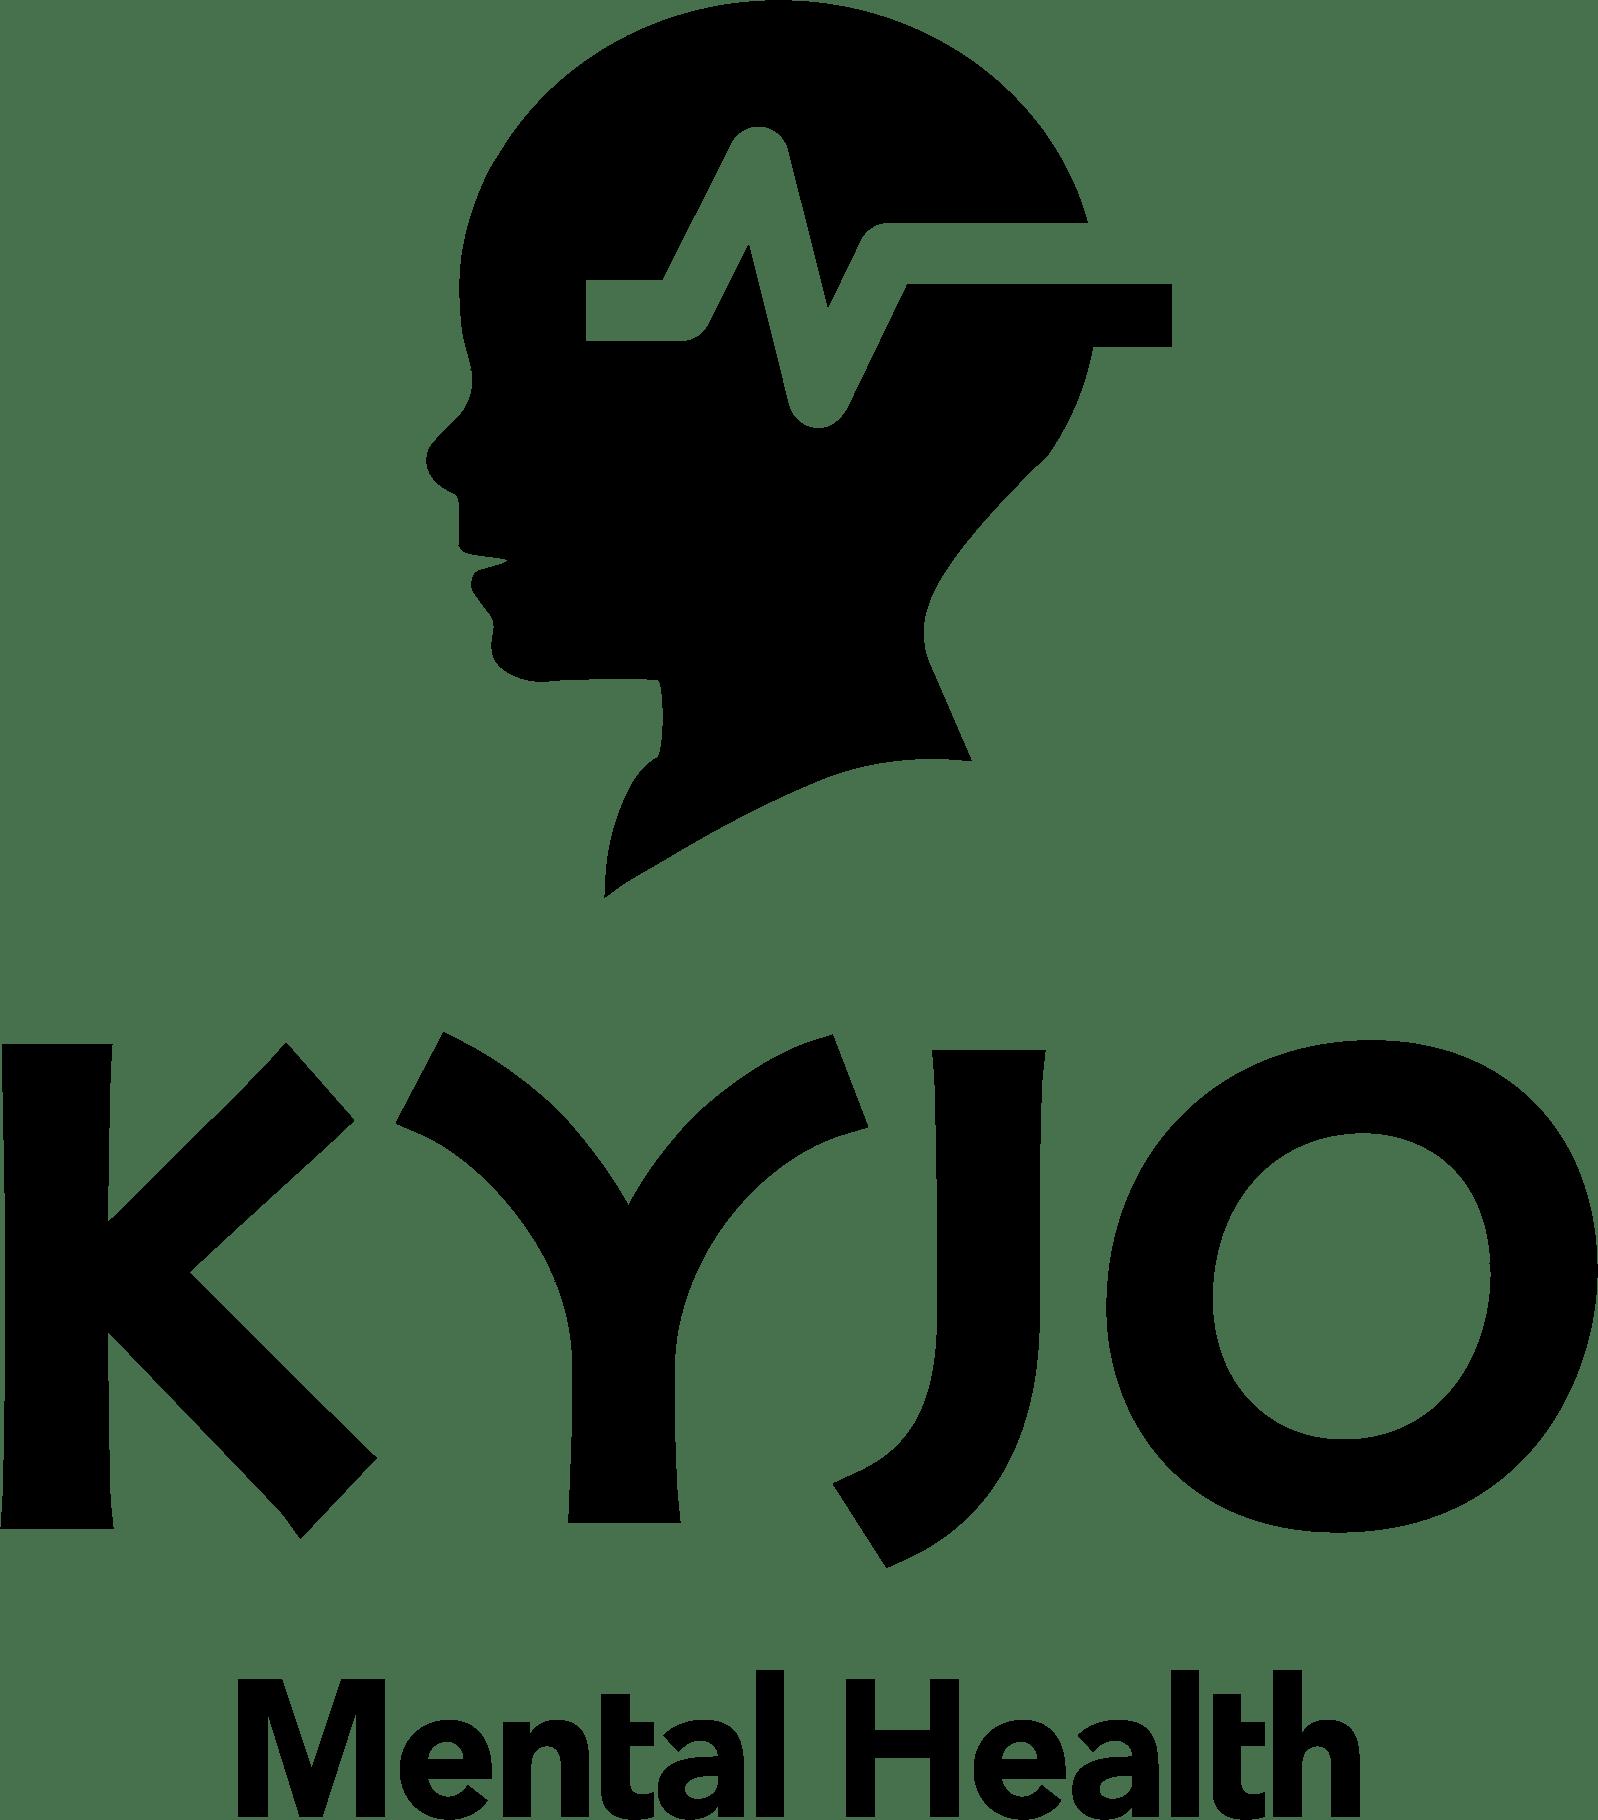 KYJO_MH_Logo_Vertical_B&W